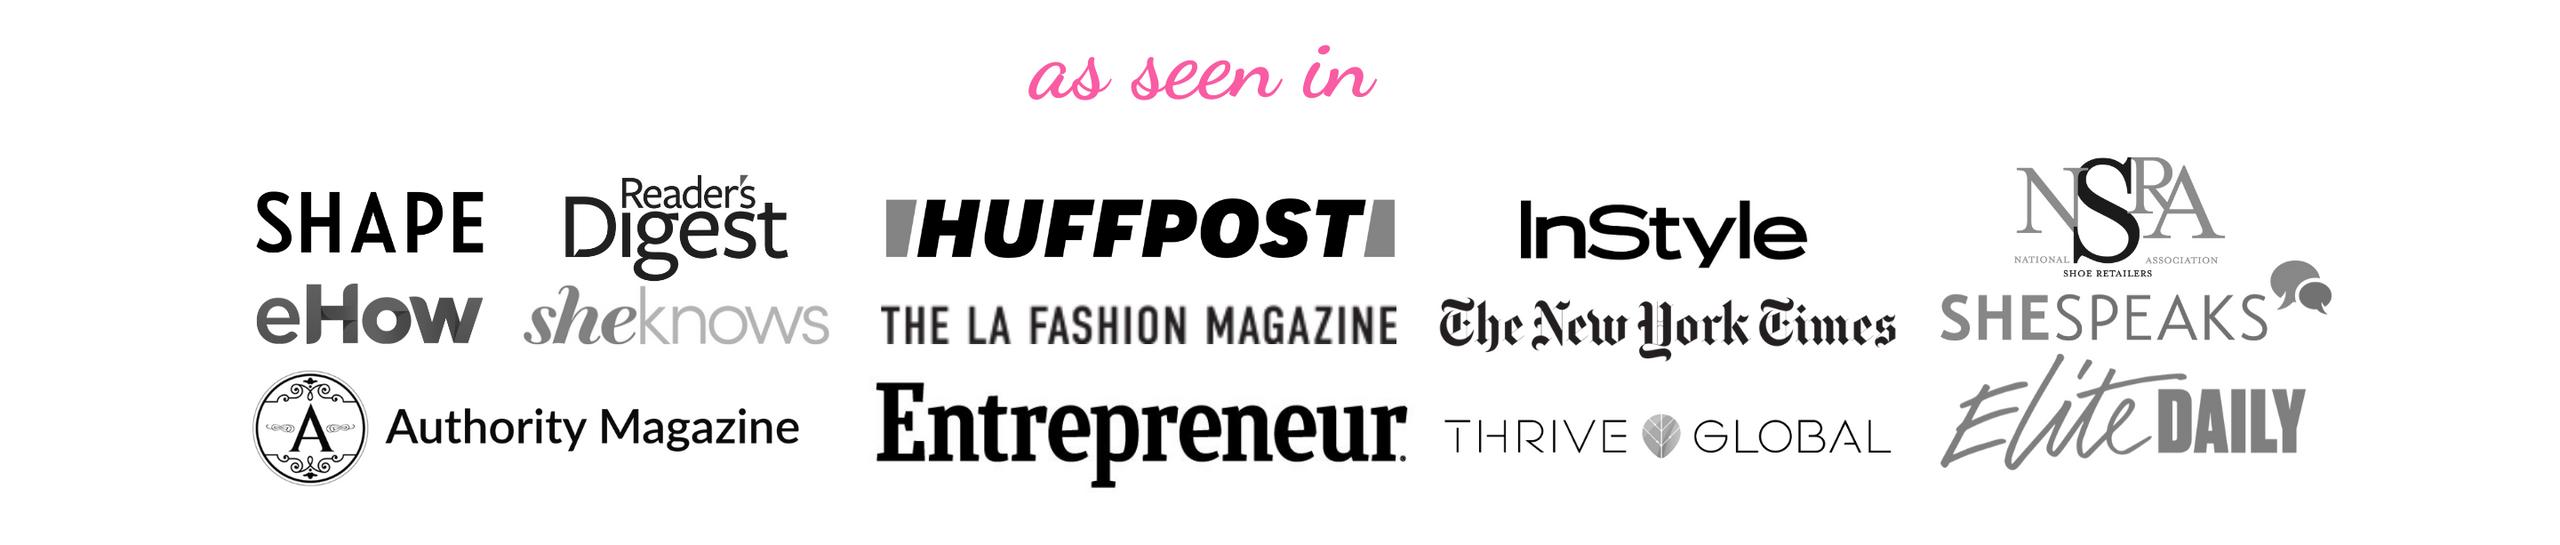 Inspiring Brands Academy Press - Digital Entrepreneur and Business Branding Expert Christina-Lauren Pollack